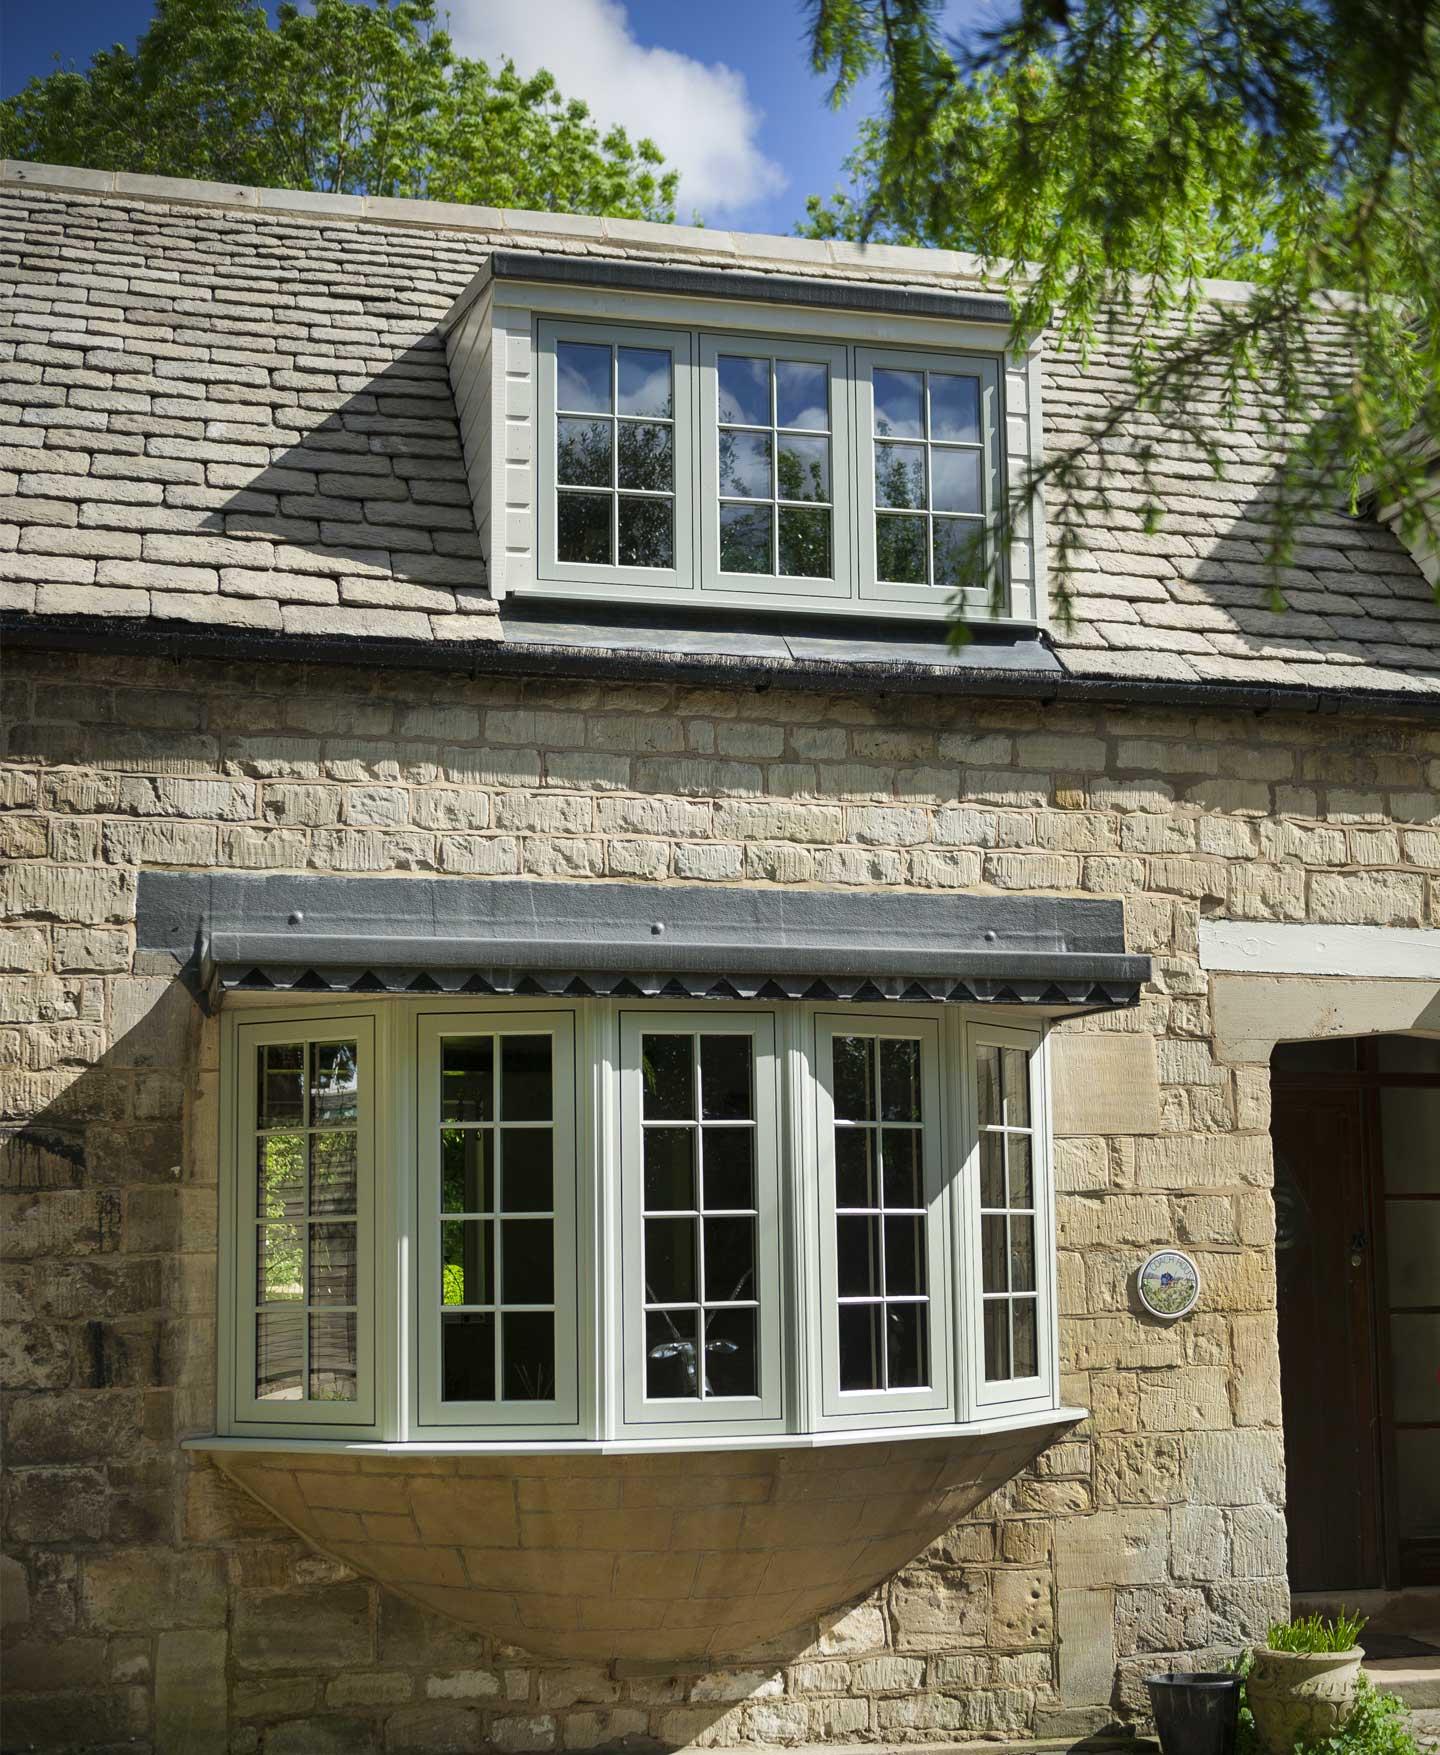 residence windows